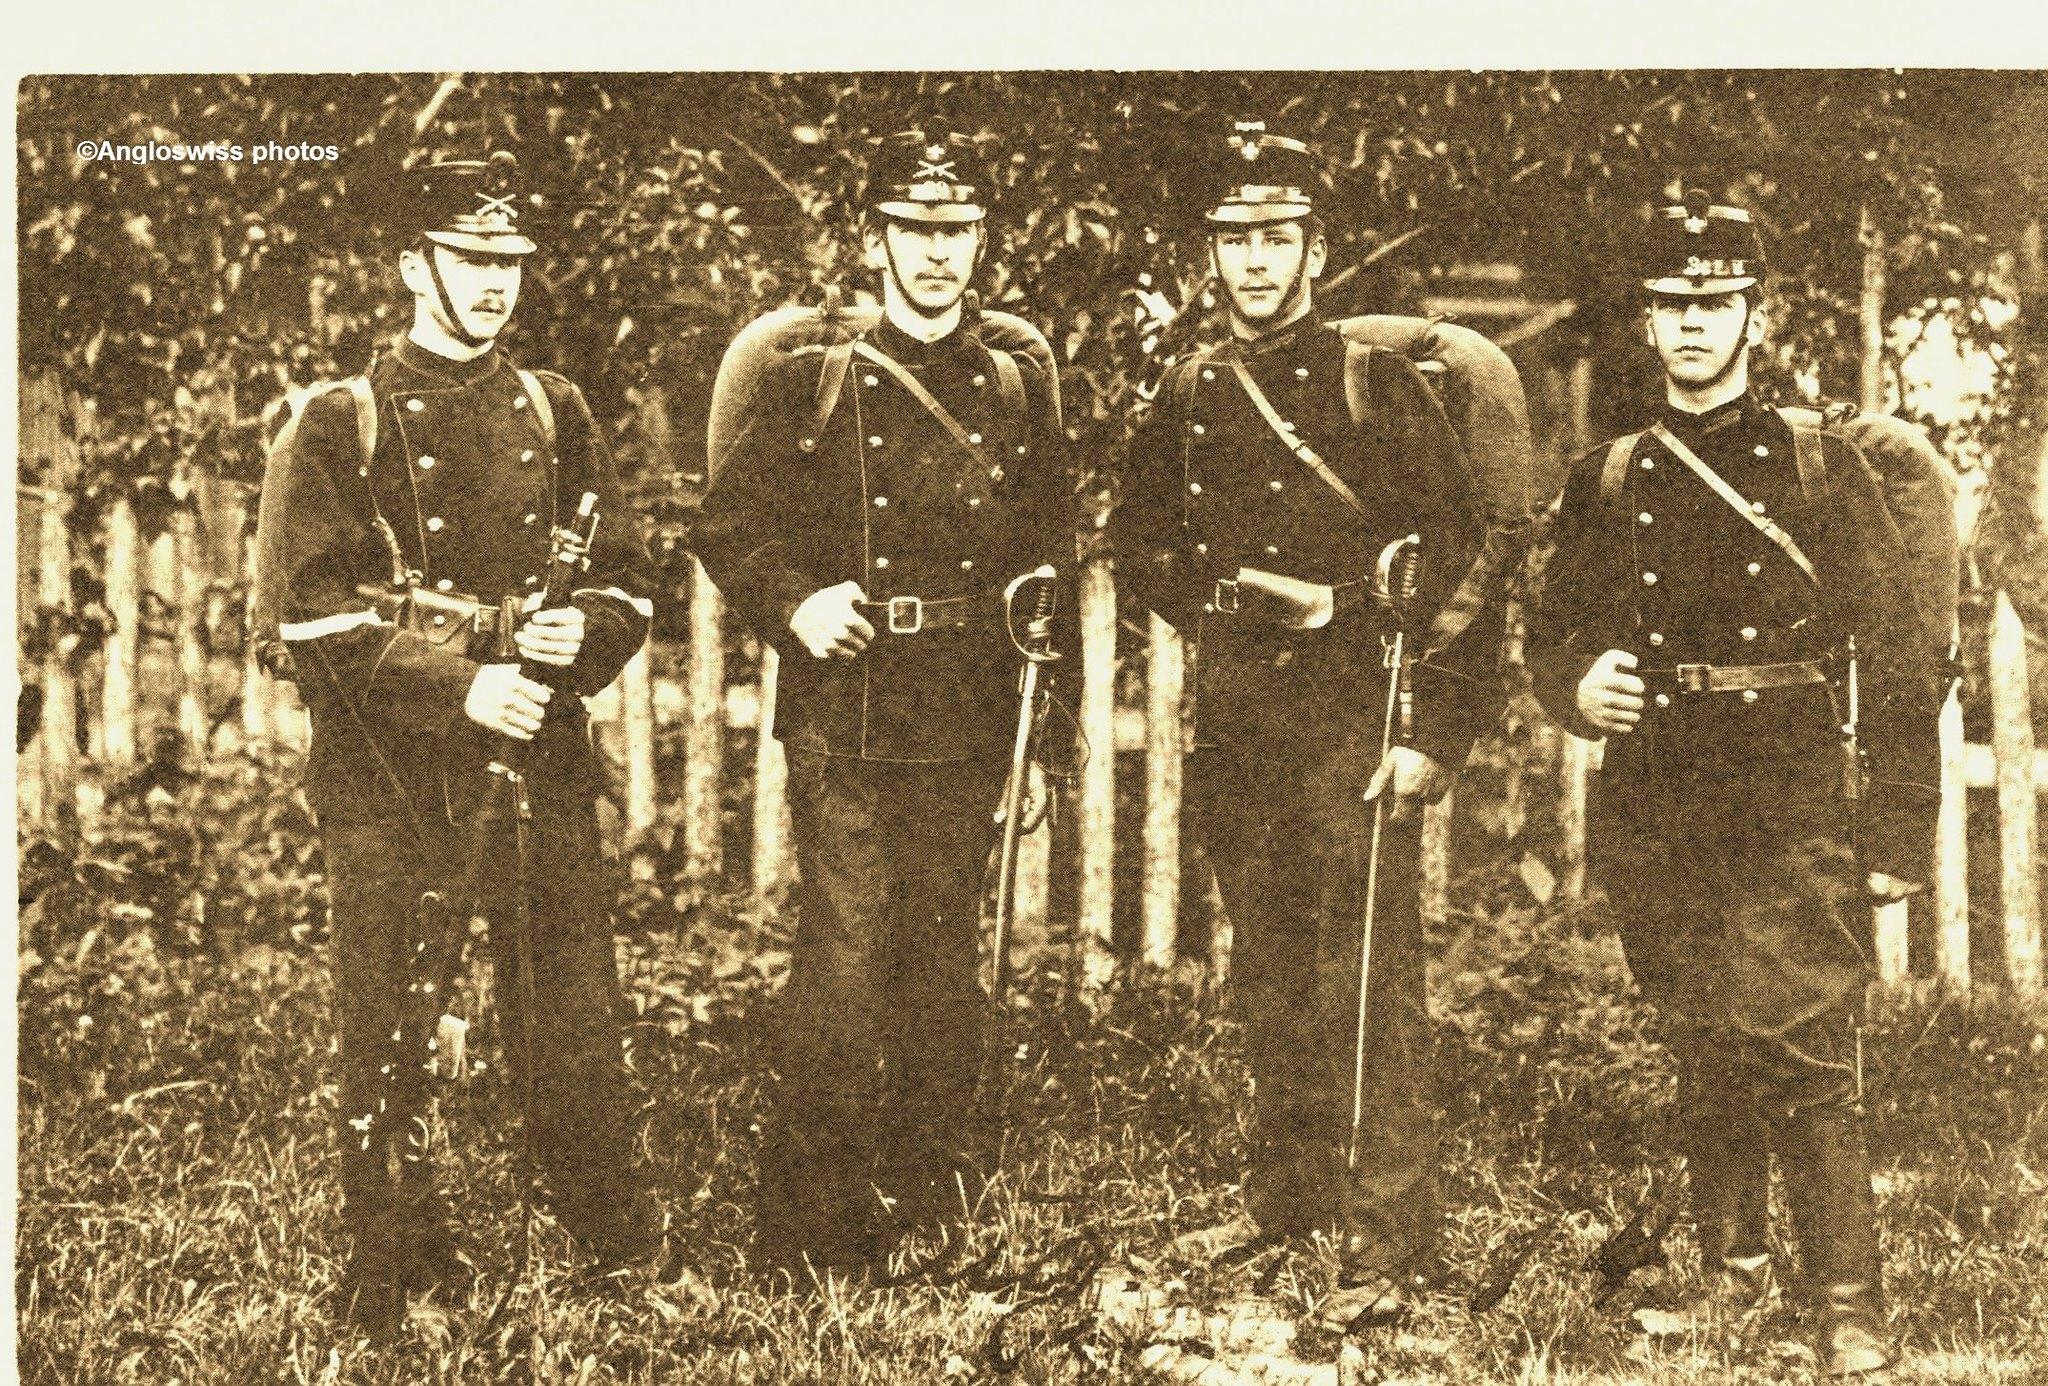 Fritz, Rudolf, Hans, Oscar Gerber